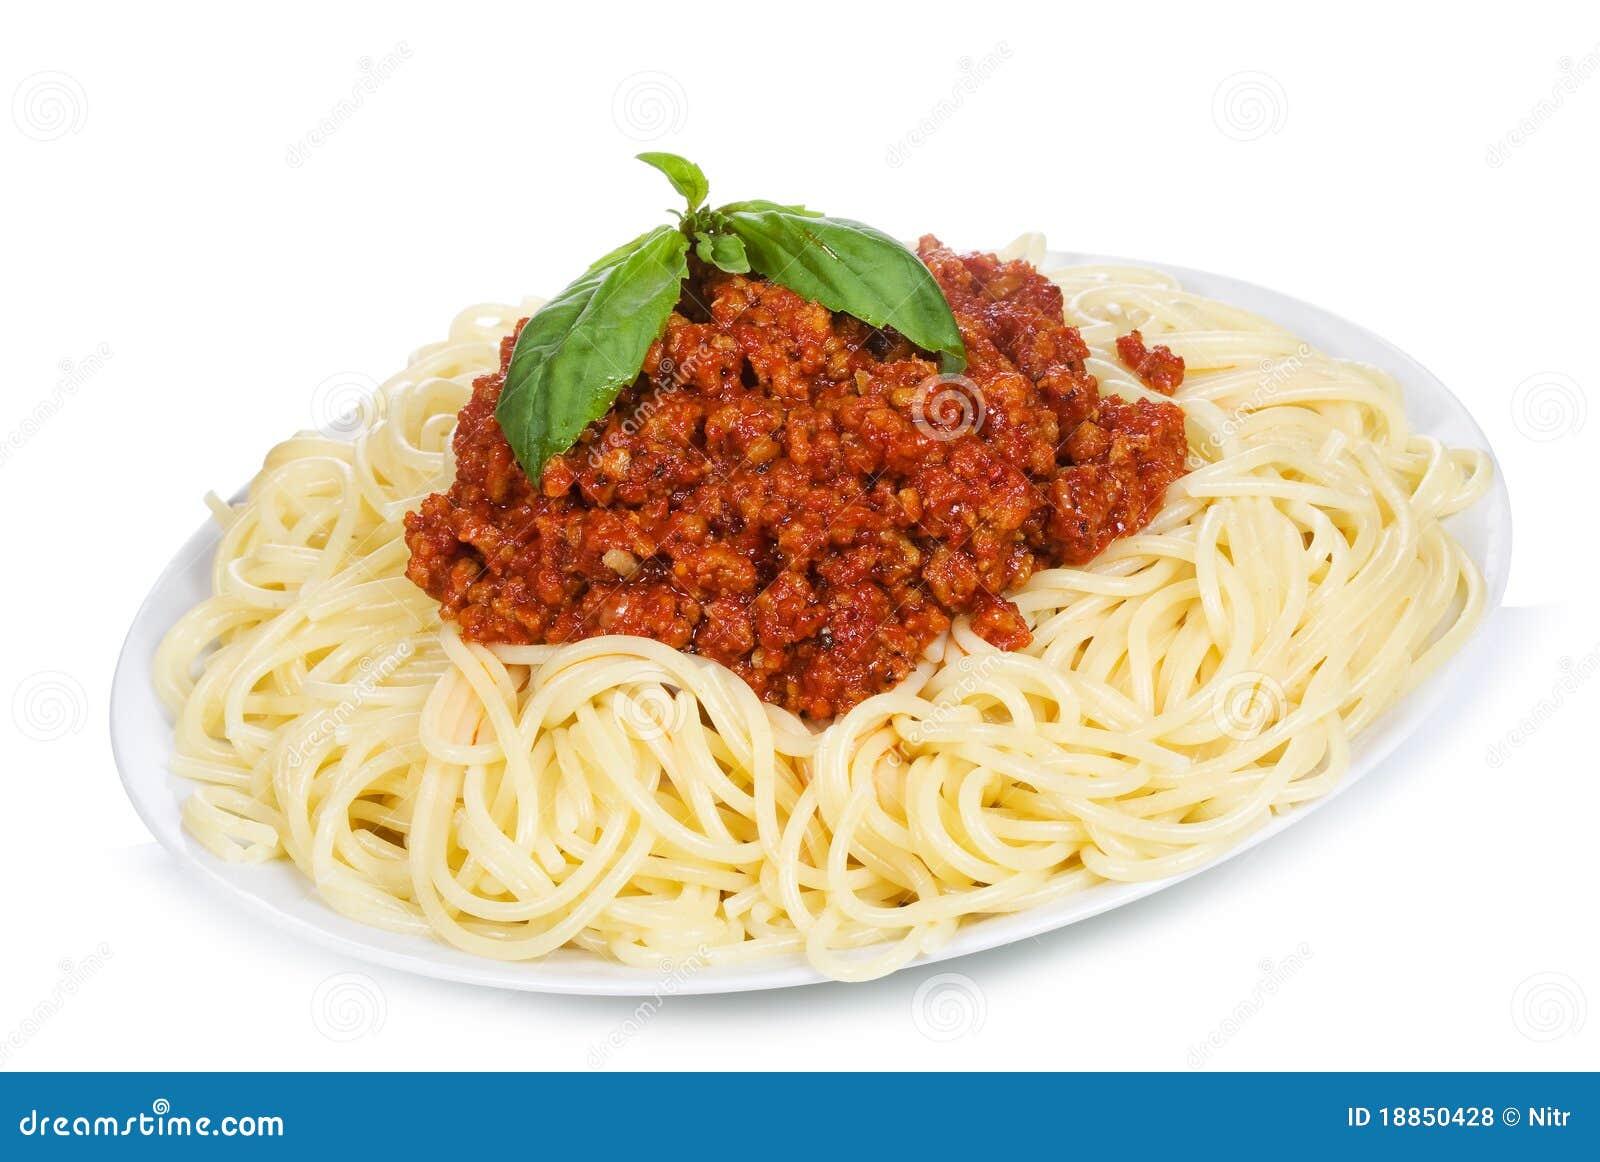 Spaghetti Bolognese Royalty Free Stock Photos - Image: 18850428